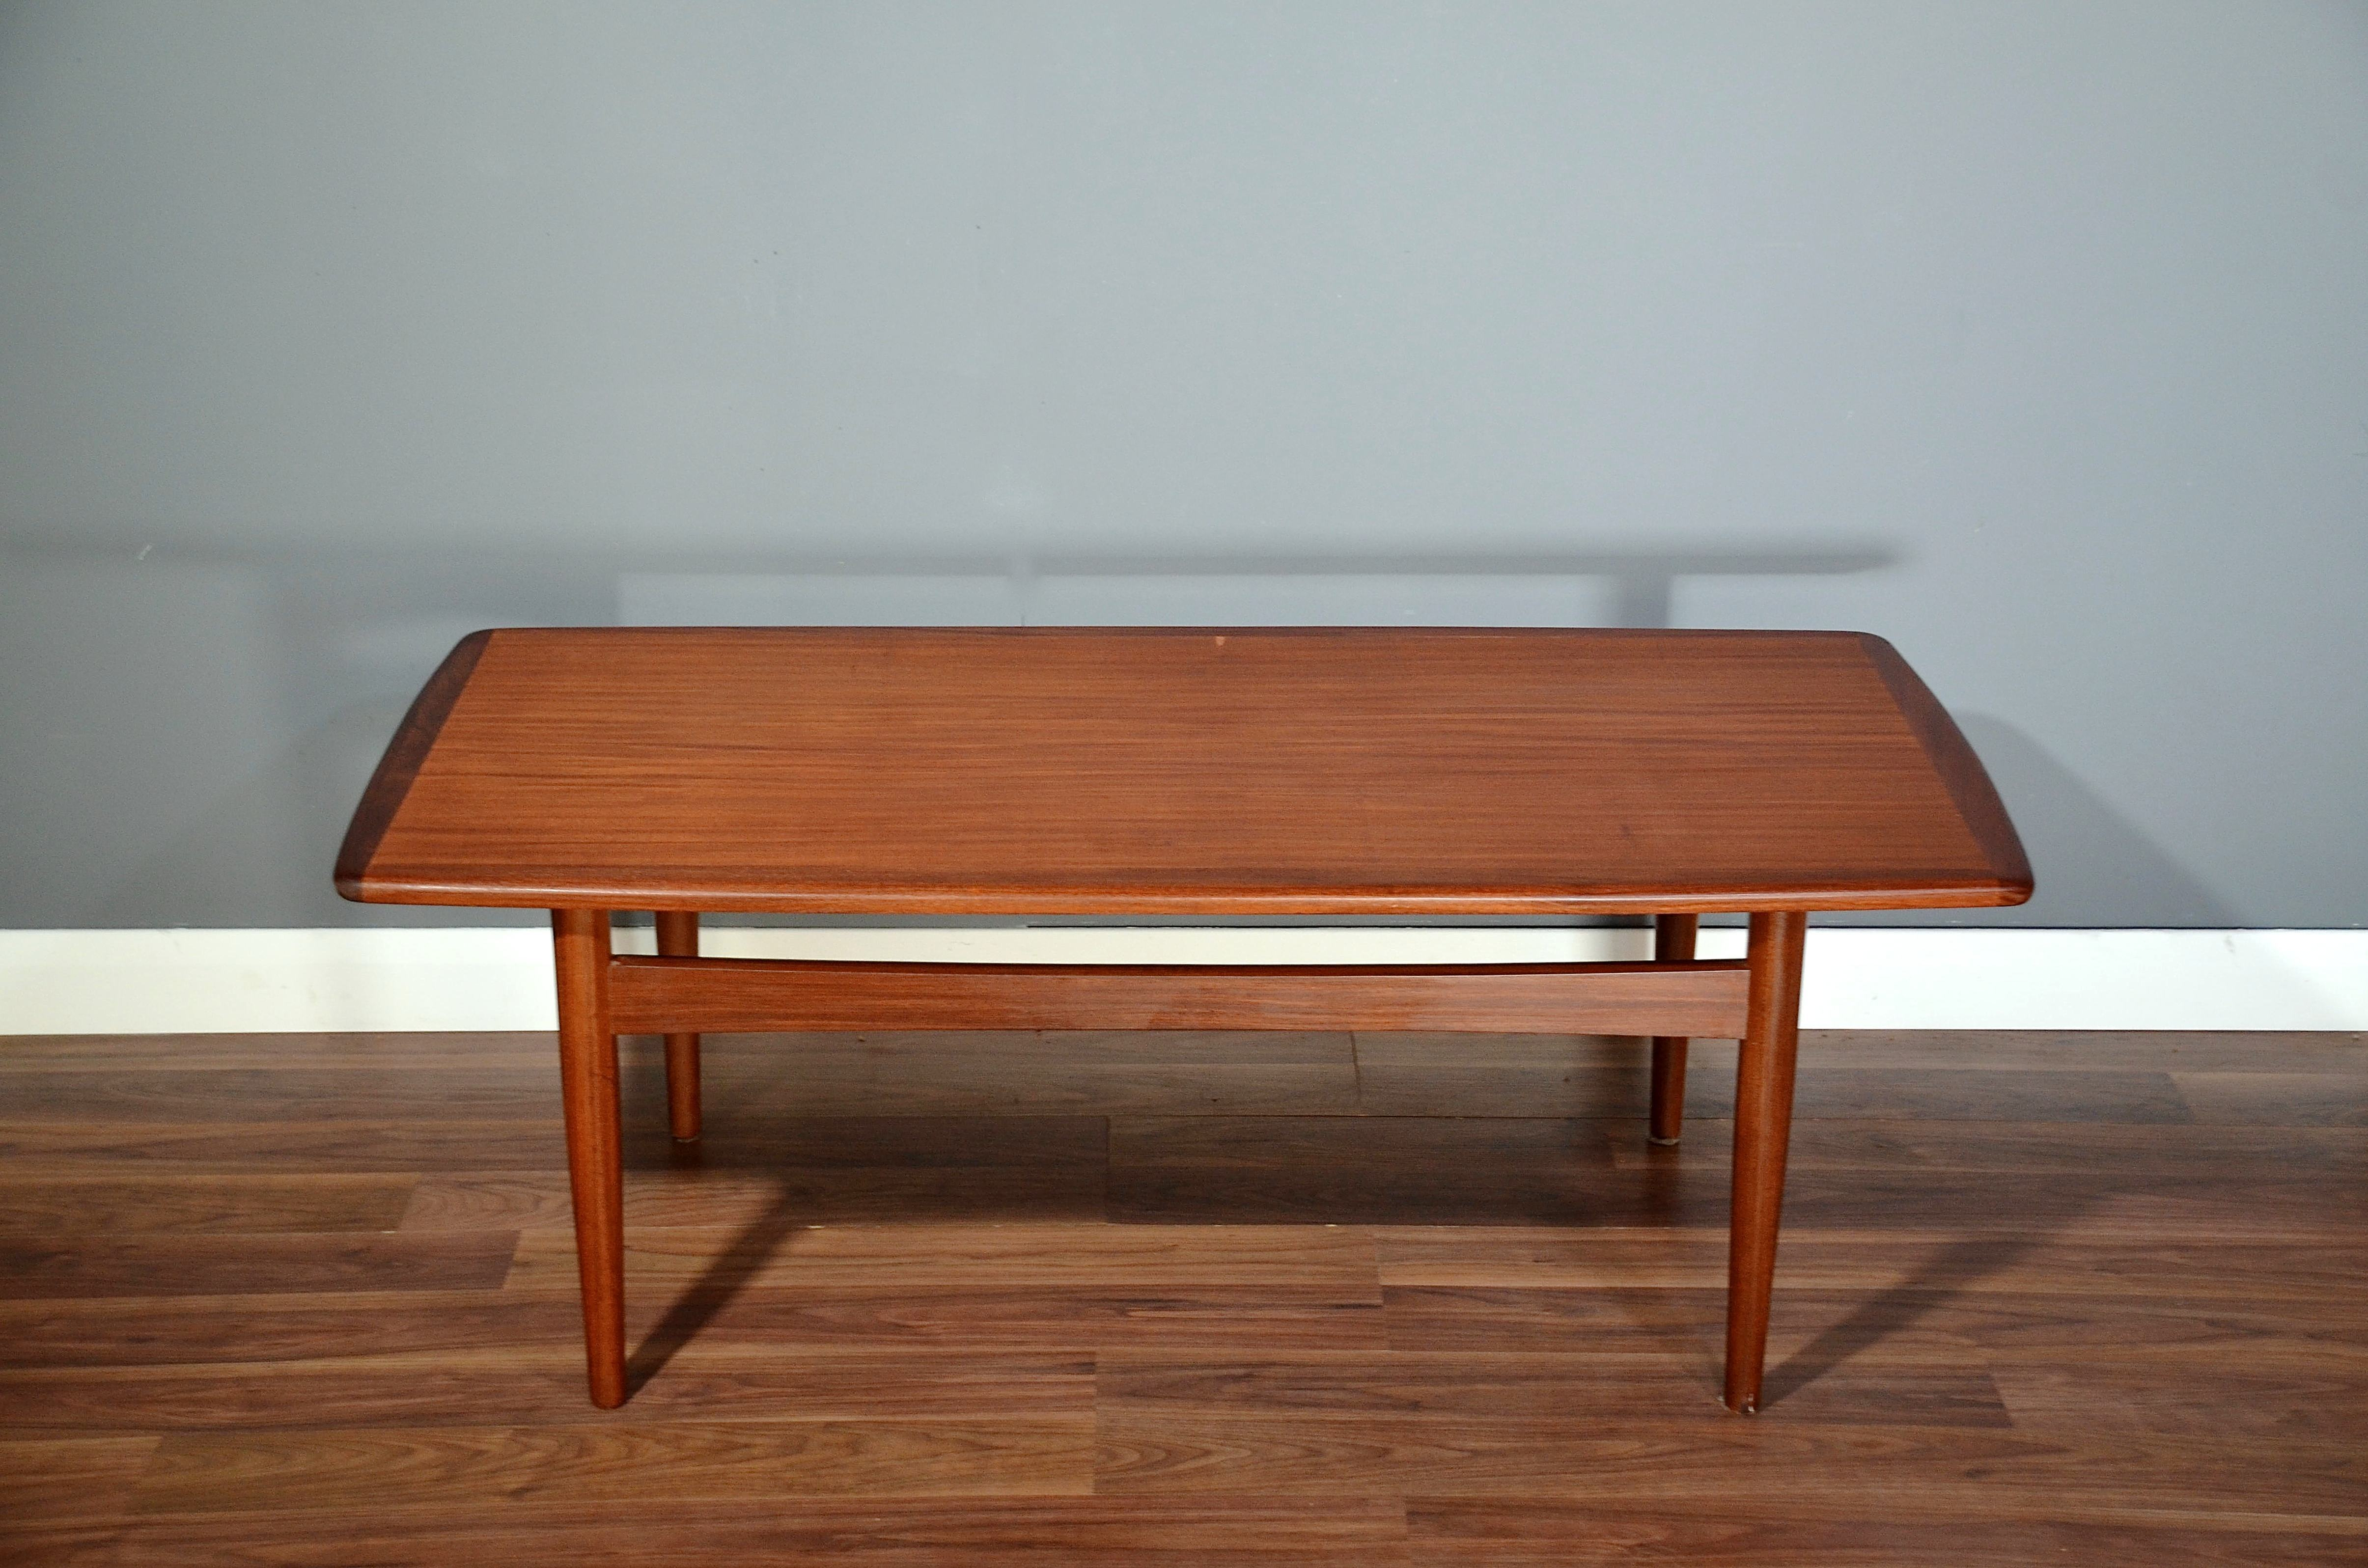 Vintage Danish Teak Coffee Table Delivery Modern Midcentury Retro Vinterior